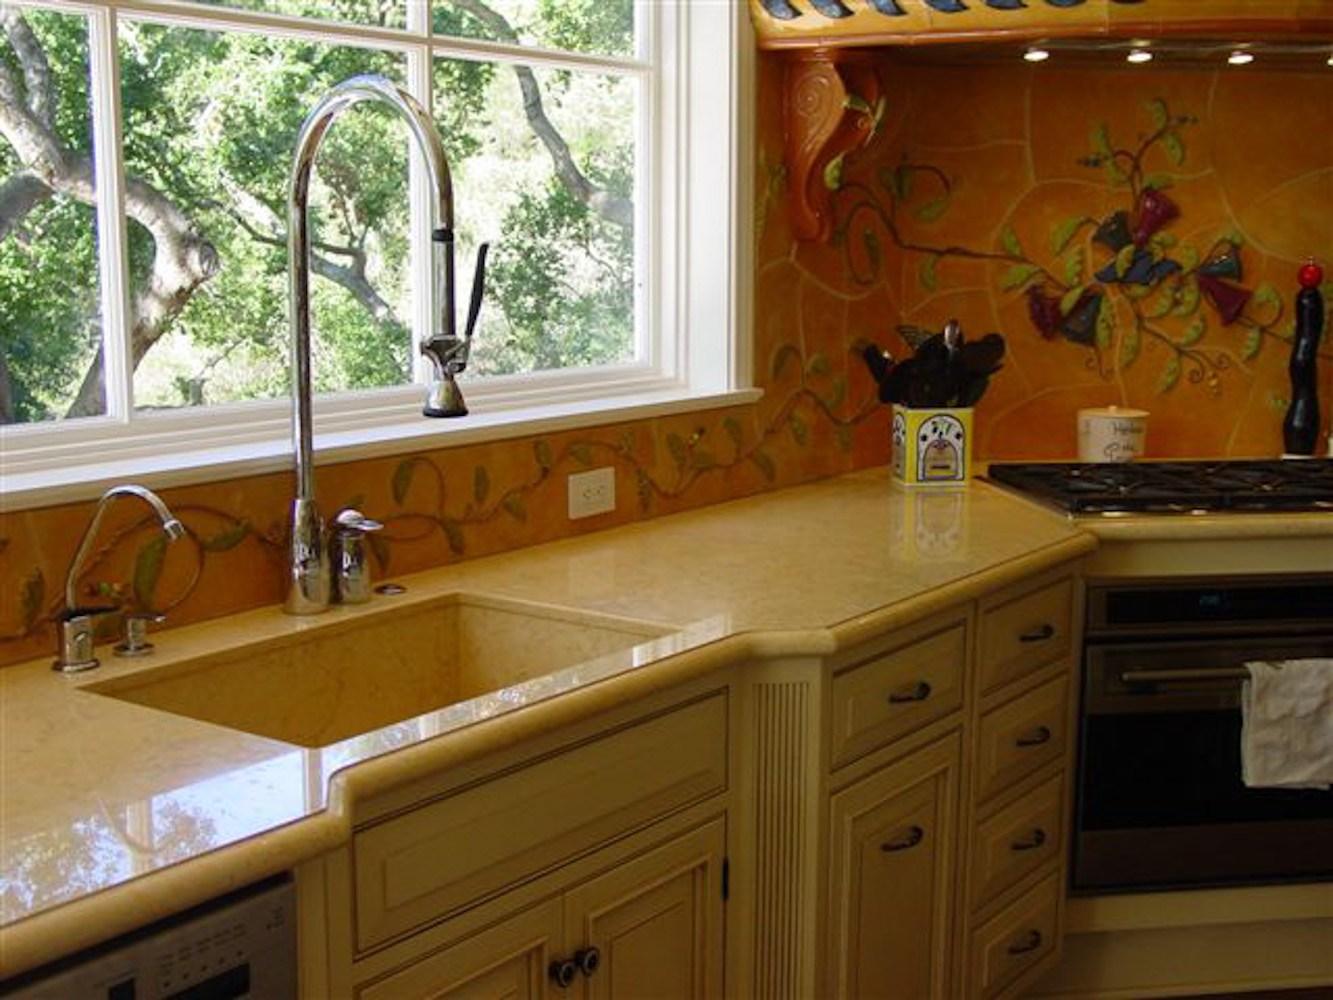 PSW Designed/Fabricated Custom Sink